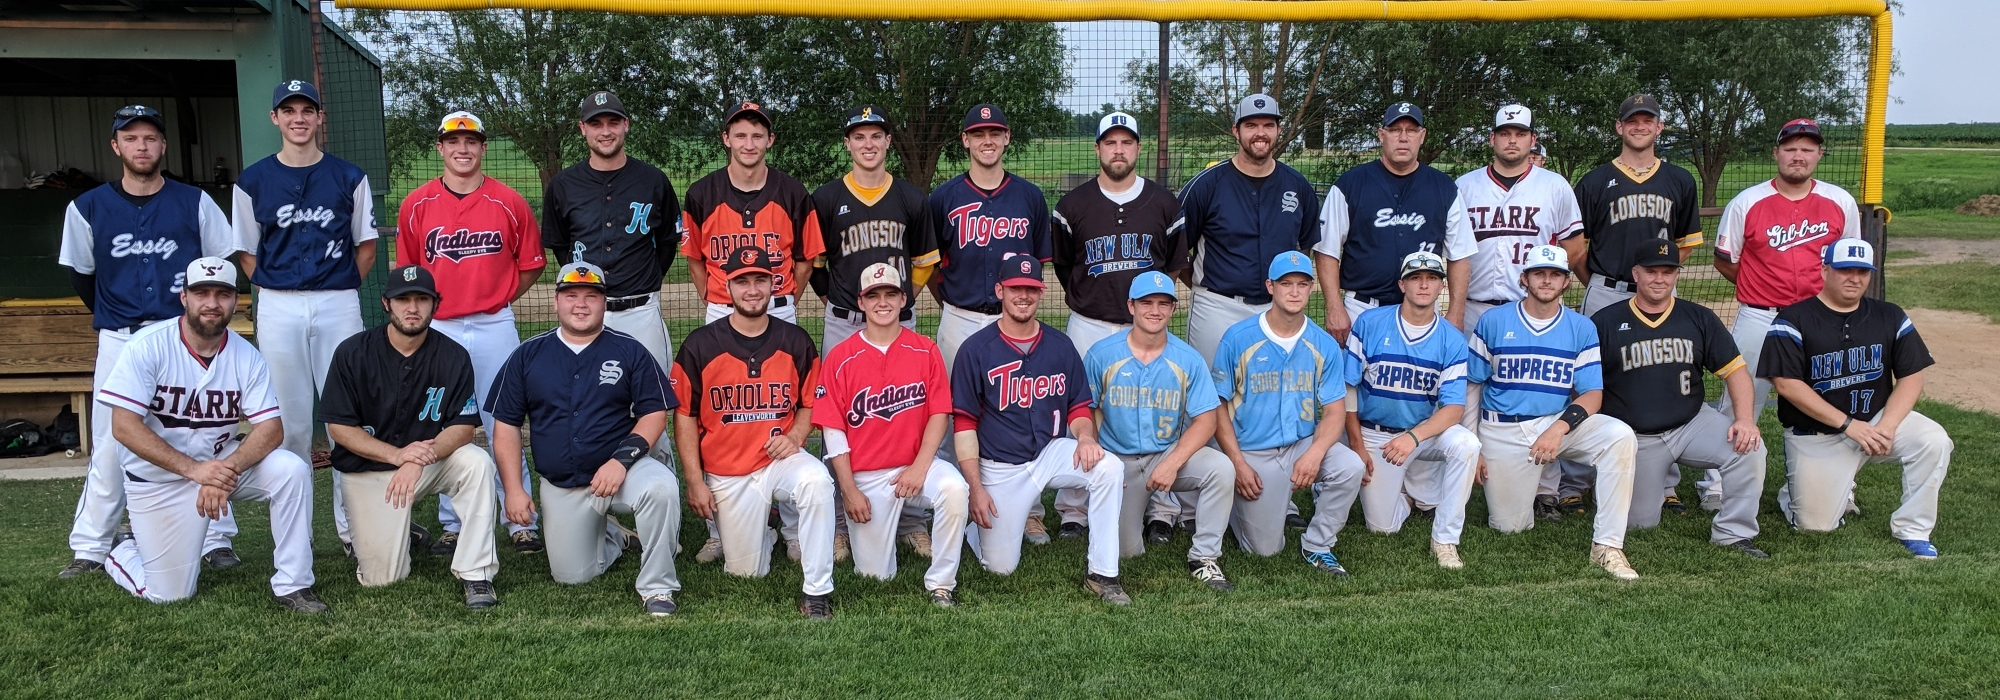 Nieuw Tomahawk East League - 2018 Tomahawk East vs Corn Belt All-Star ZX-51